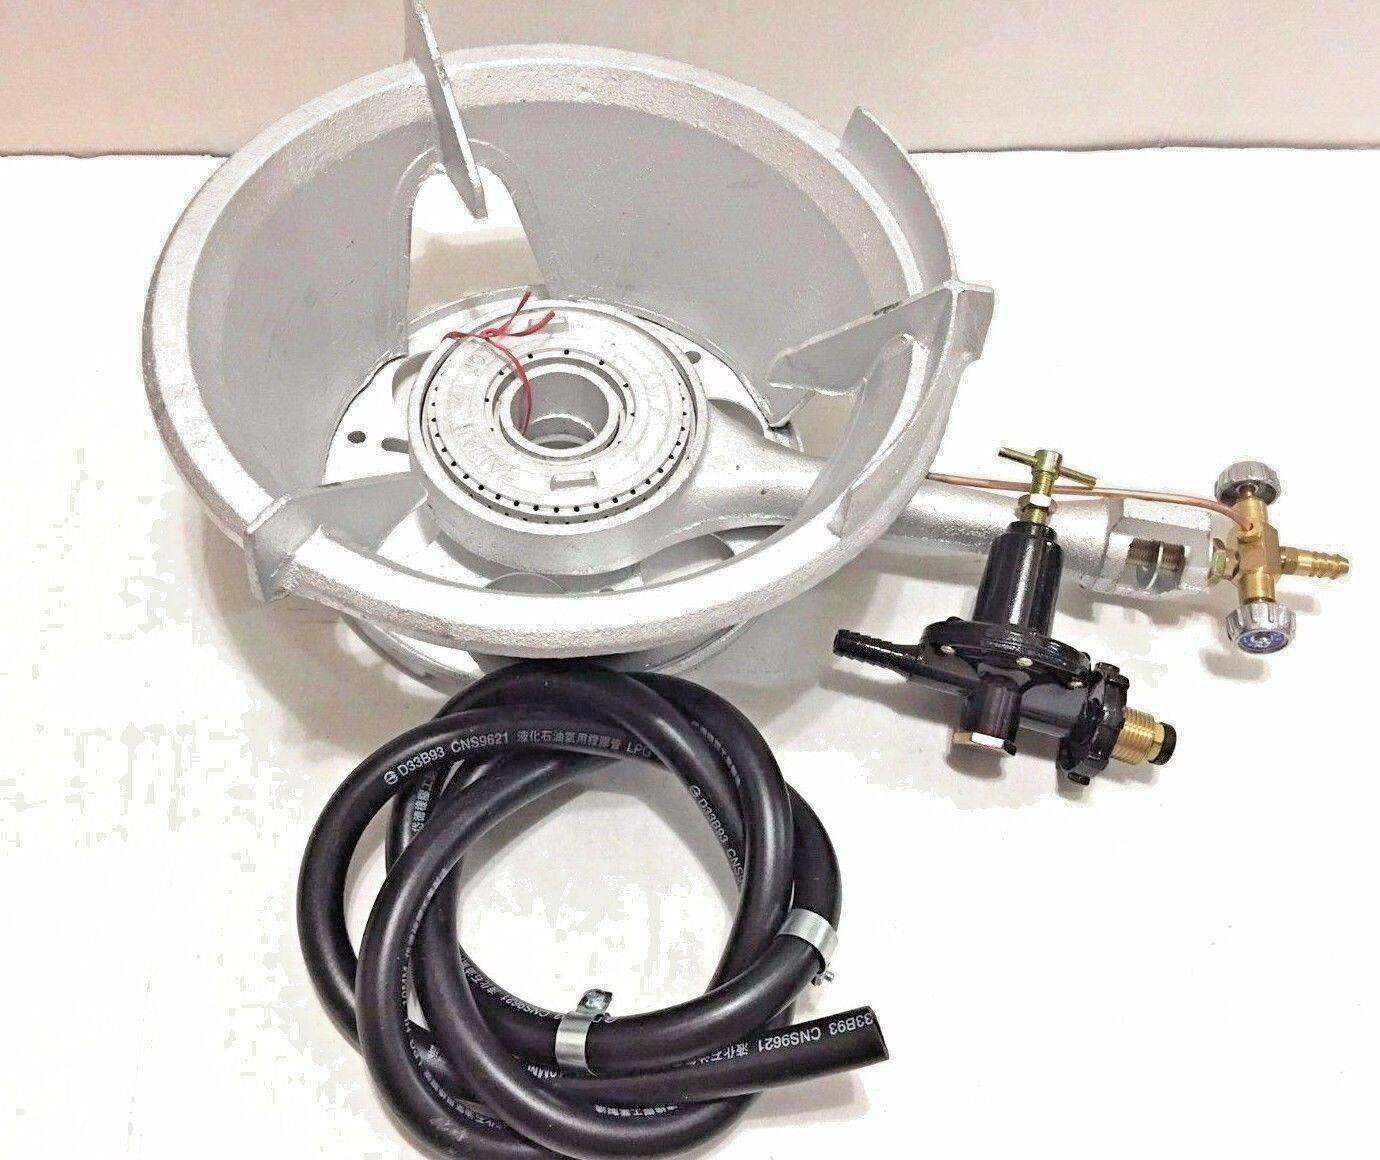 B-0006 High Pressure Burner Propane Gas Manual 12  Mouth Up to 119000 BTU HR